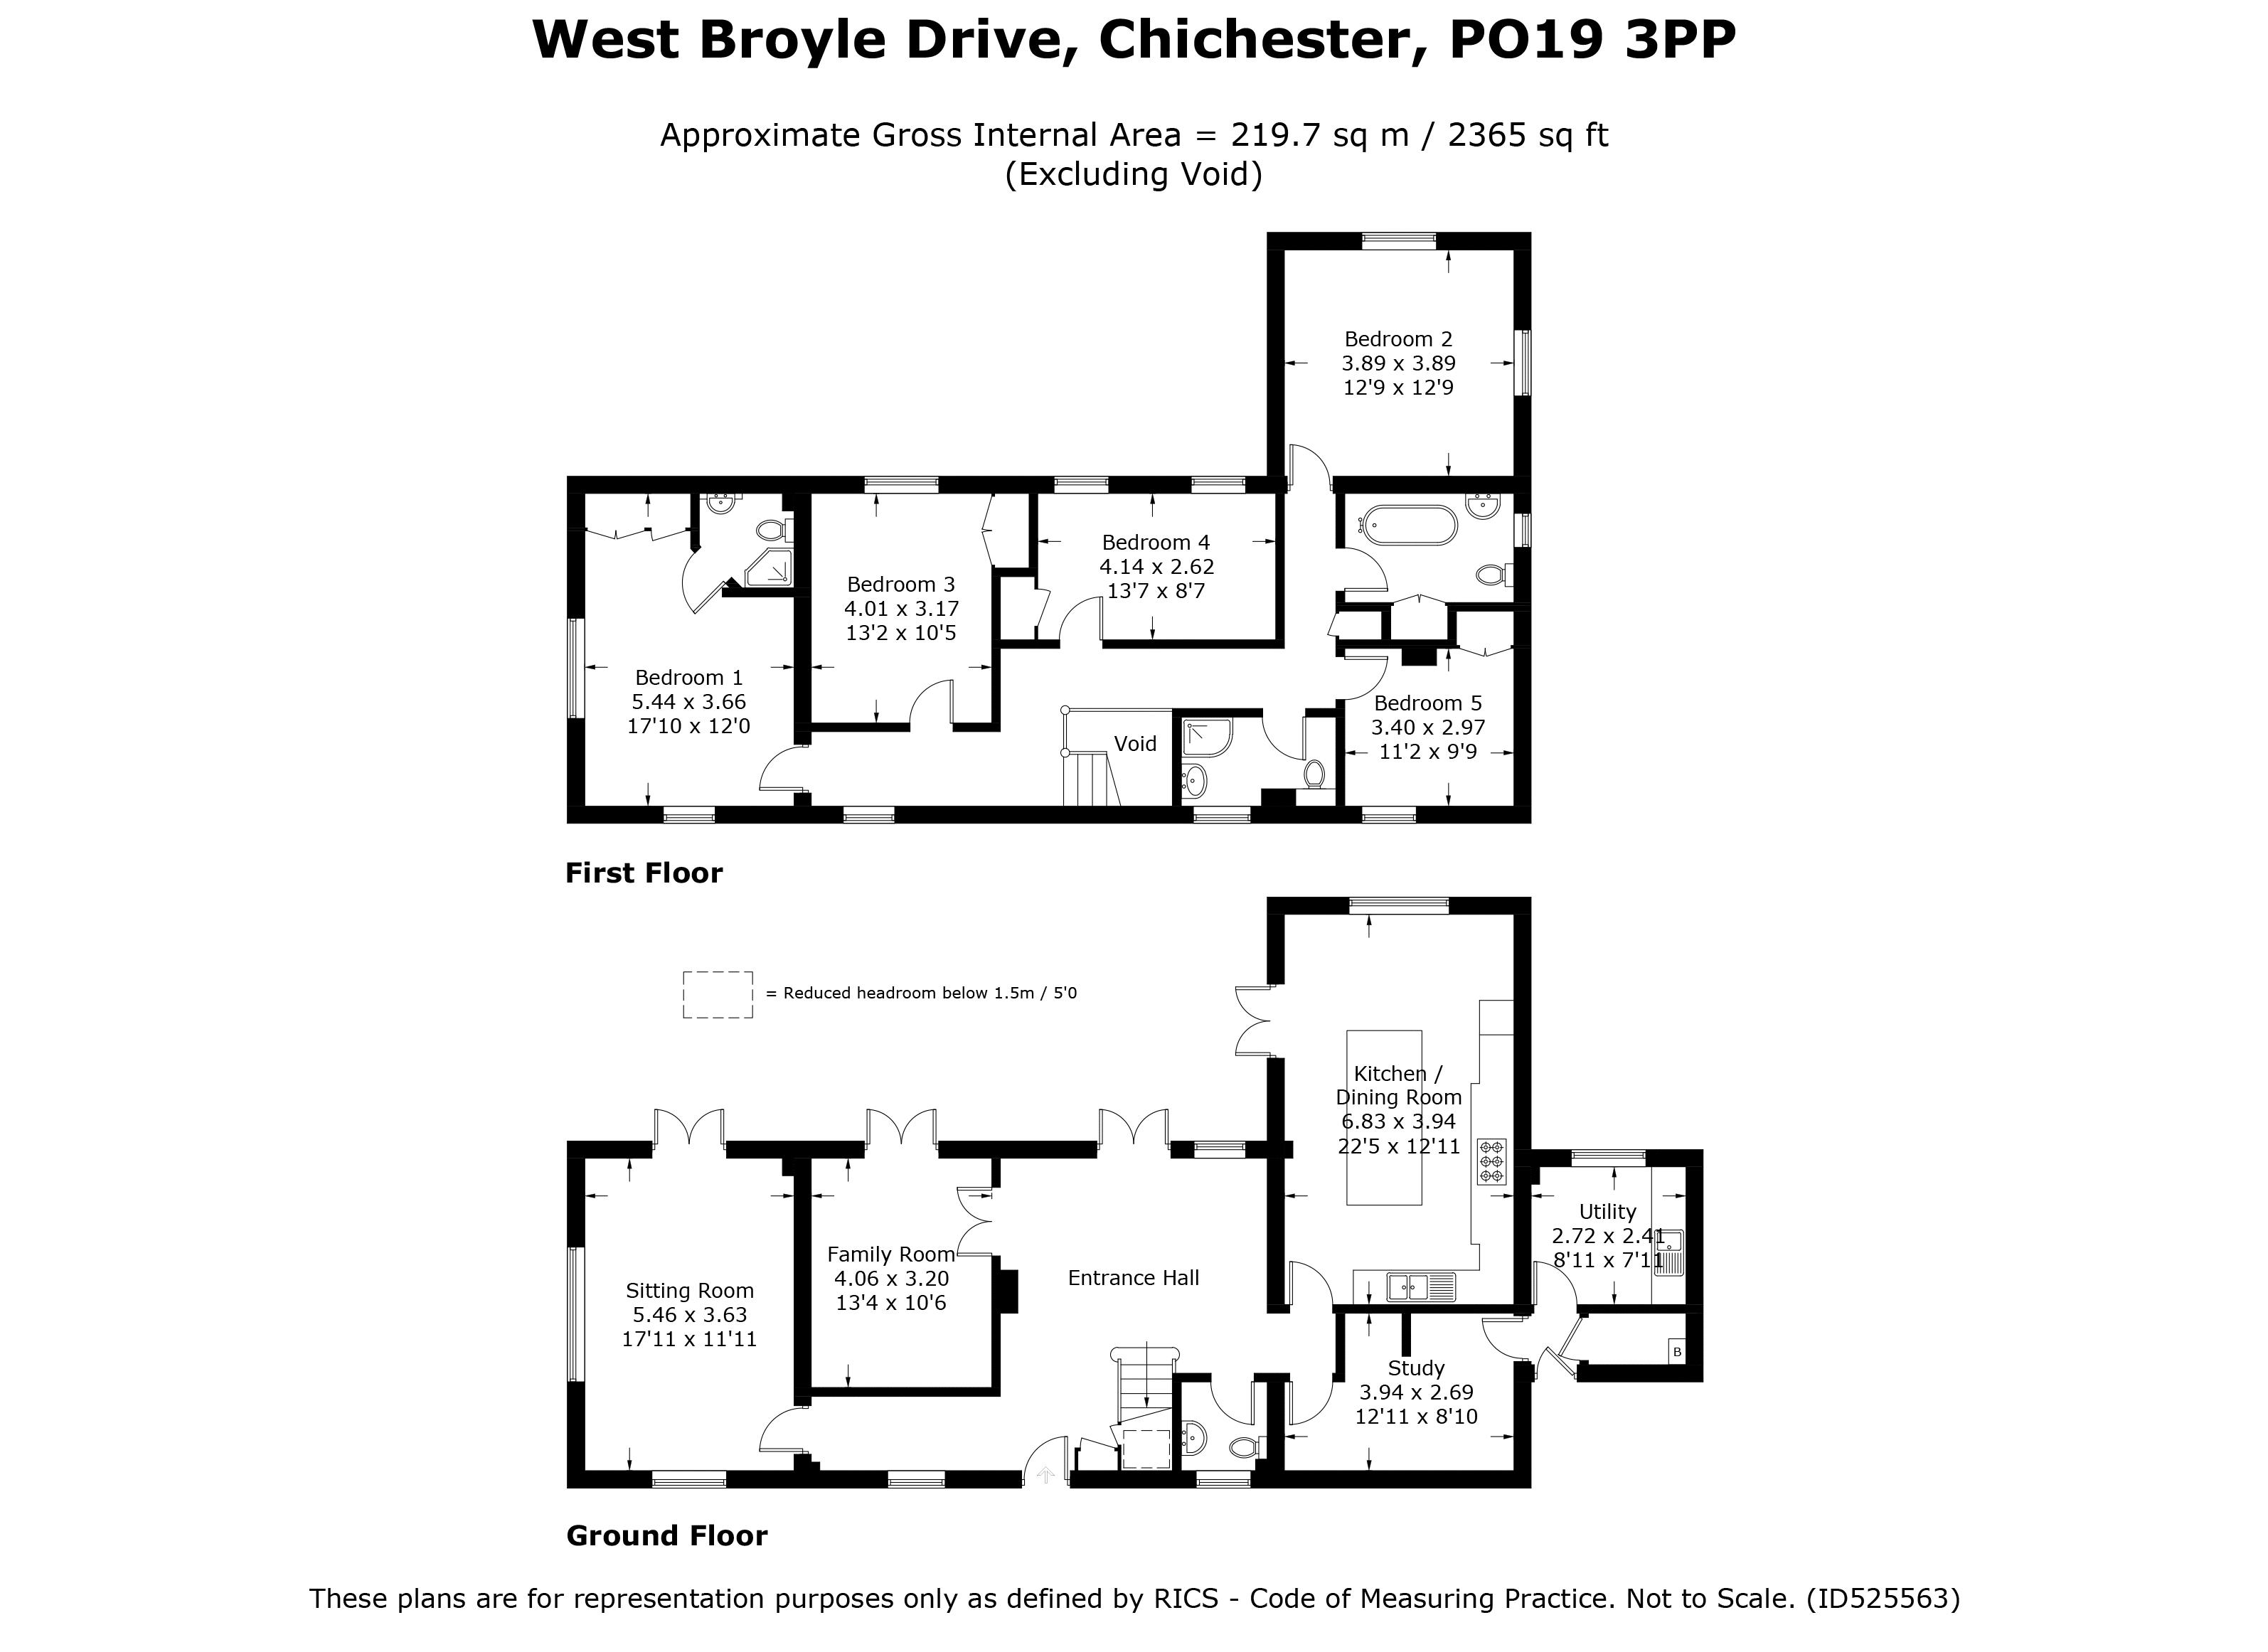 West Broyle Drive West Broyle